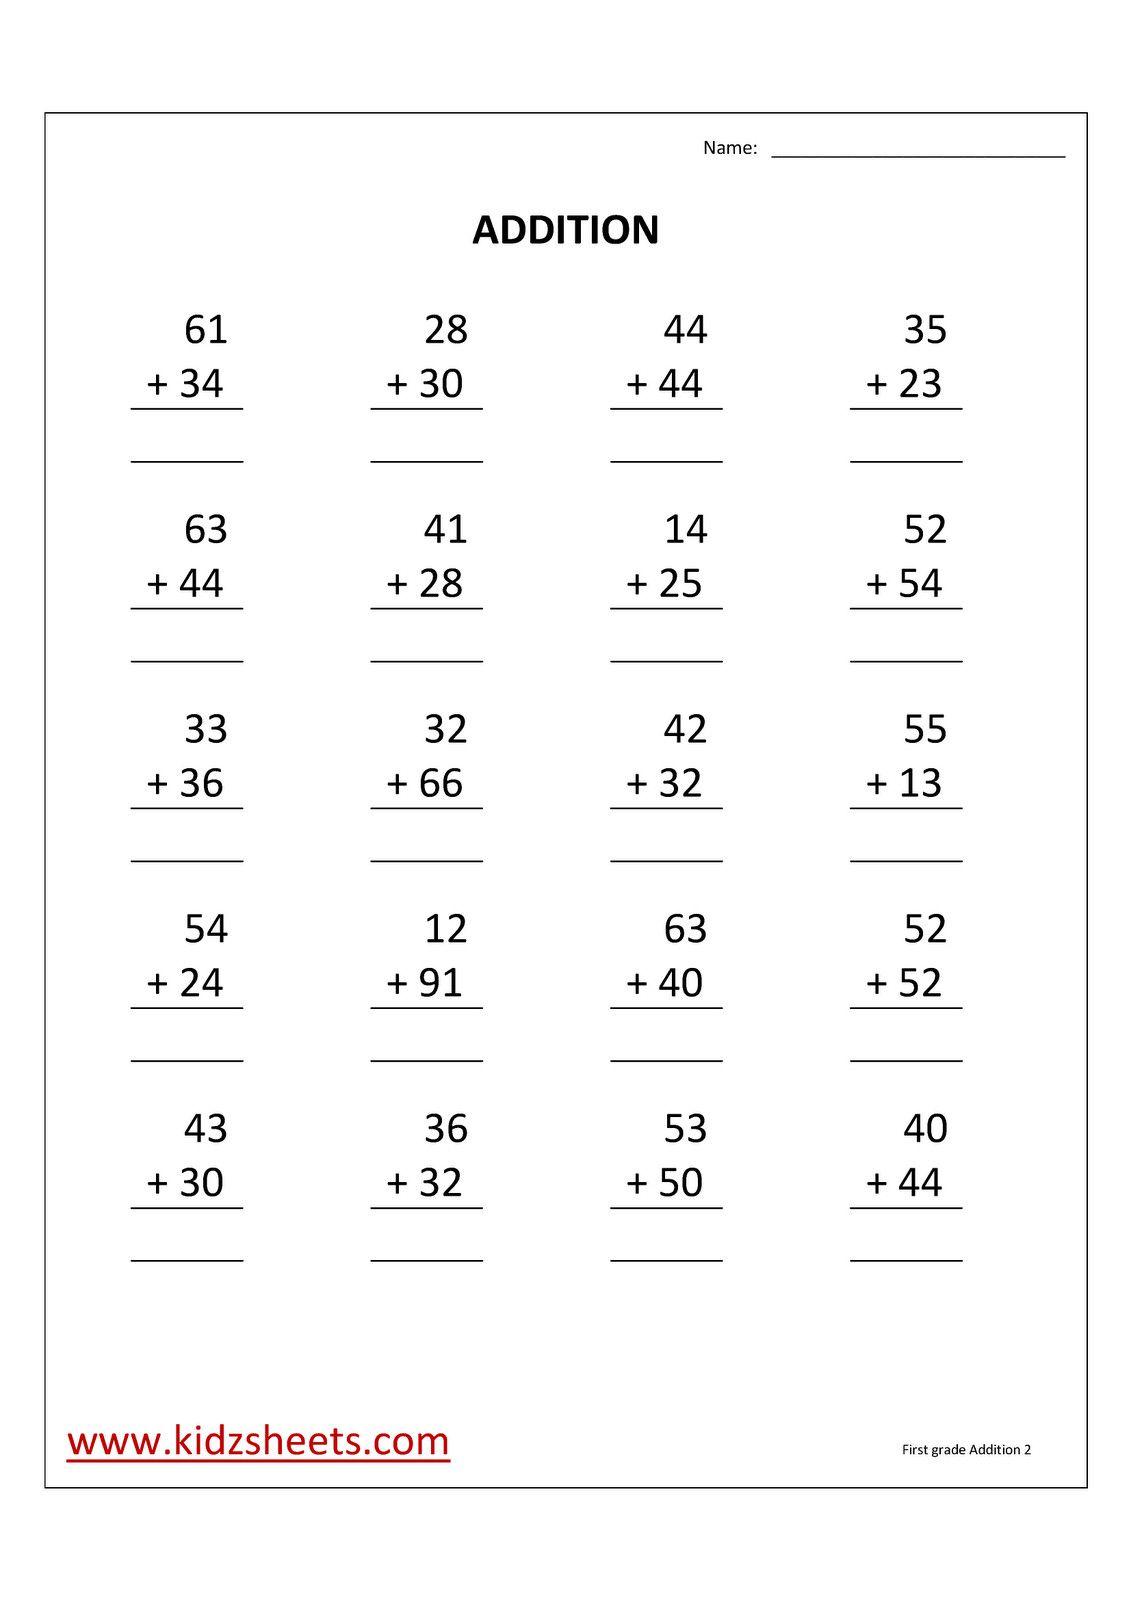 2 1st Grade Math Worksheets First Grade Math Addition Worksheets Math Addition Worksheets First Grade Math Worksheets 2nd Grade Math Worksheets Free addition math sheets for